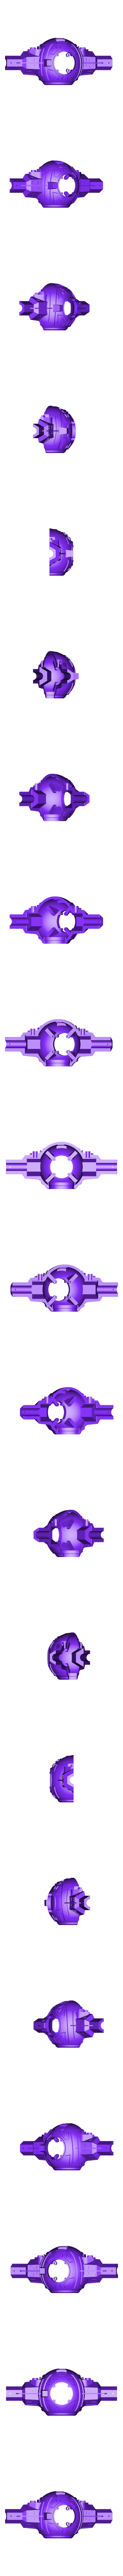 Koerper_Oben_3S.STL Download free STL file StarWars TieFighter Gen1  • 3D printable template, Supeso